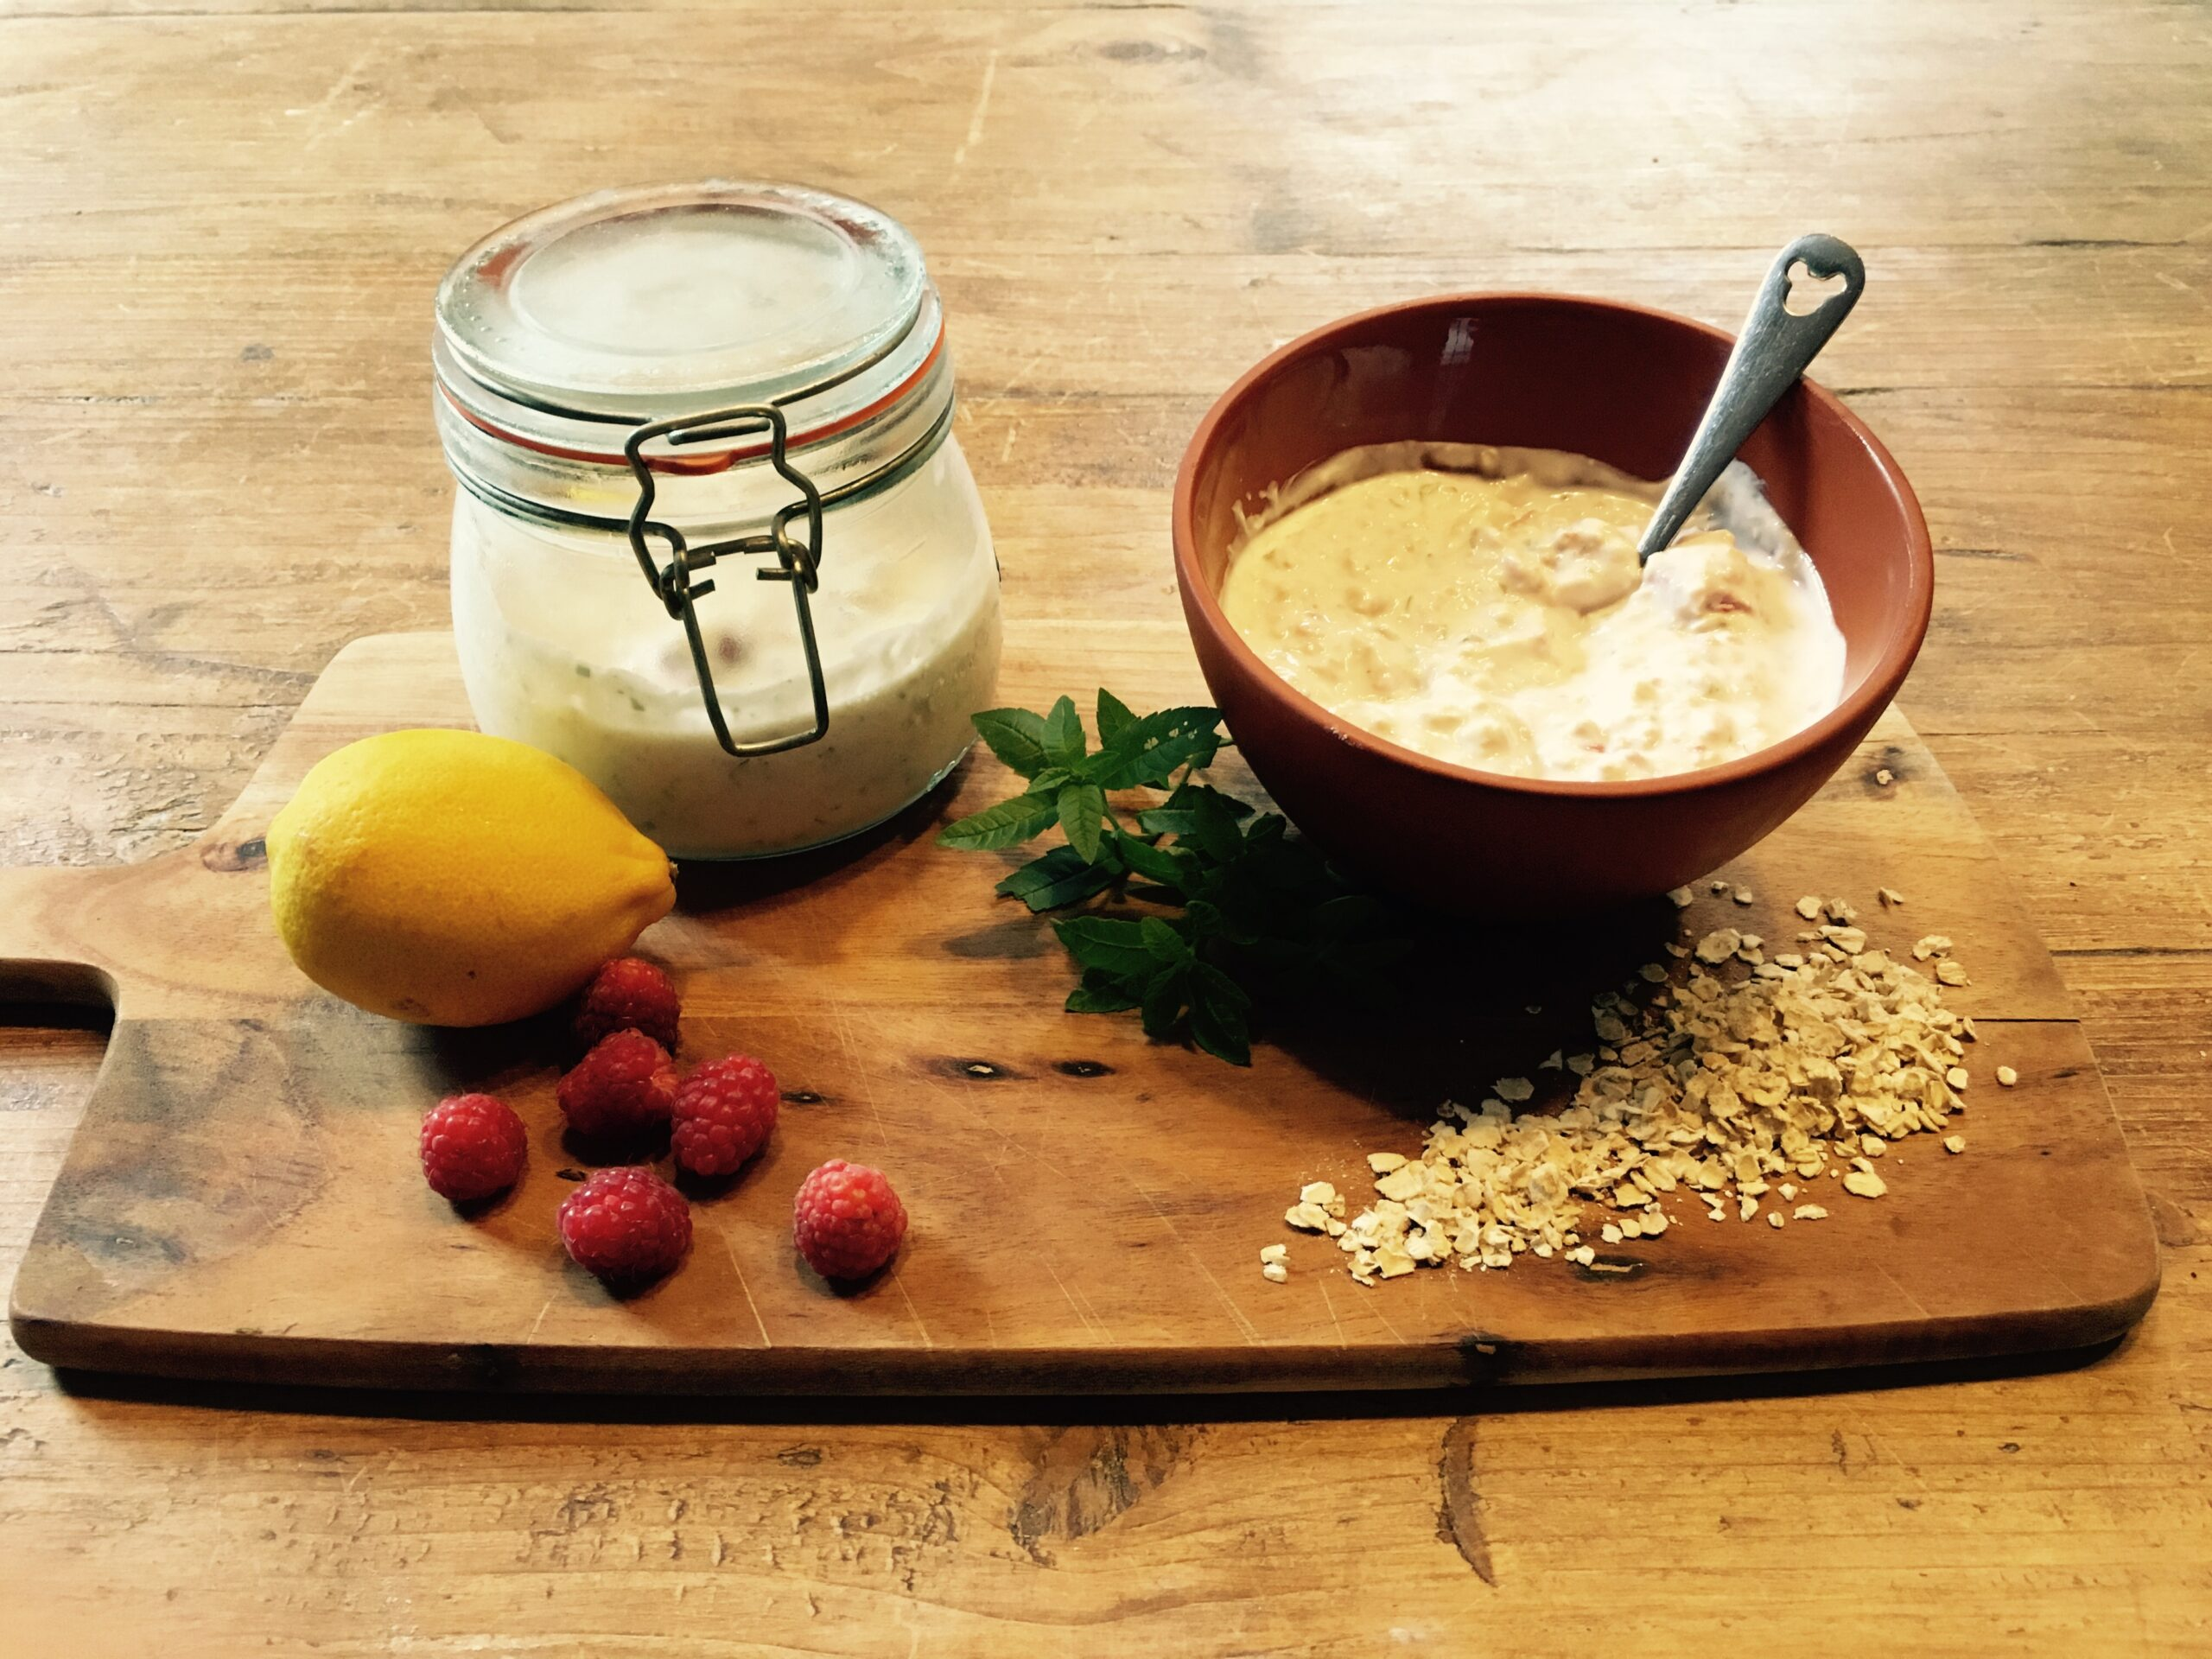 Creamy Lemon and Herb Overnight Oats